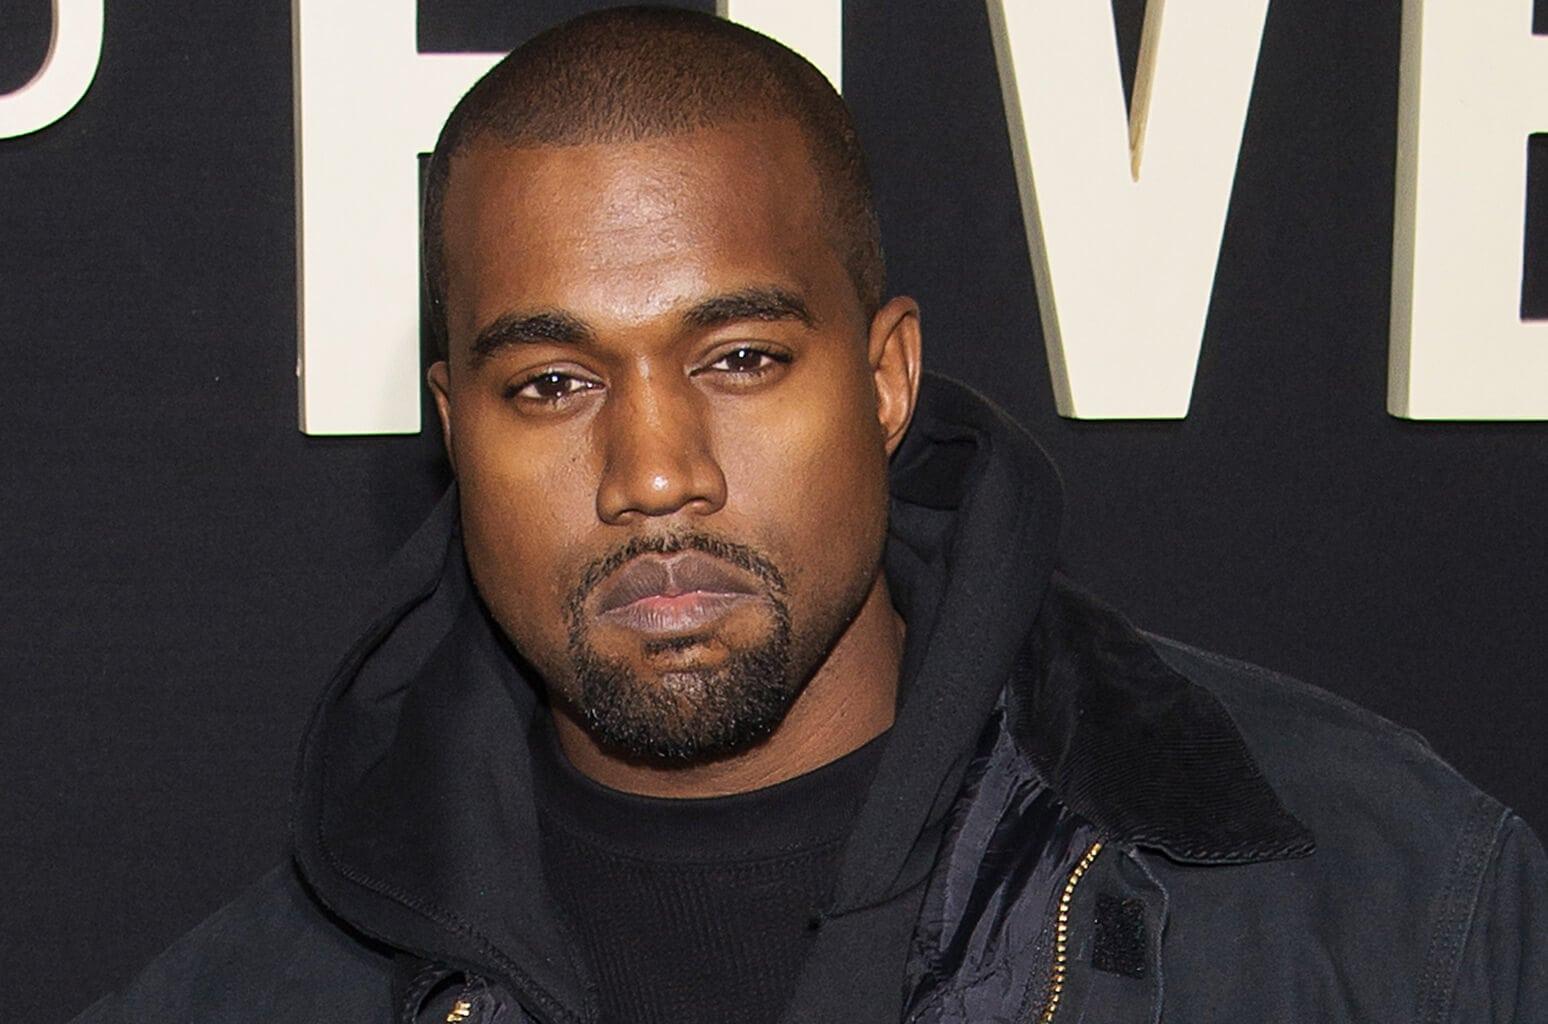 Rapper Kanye West quits social media again